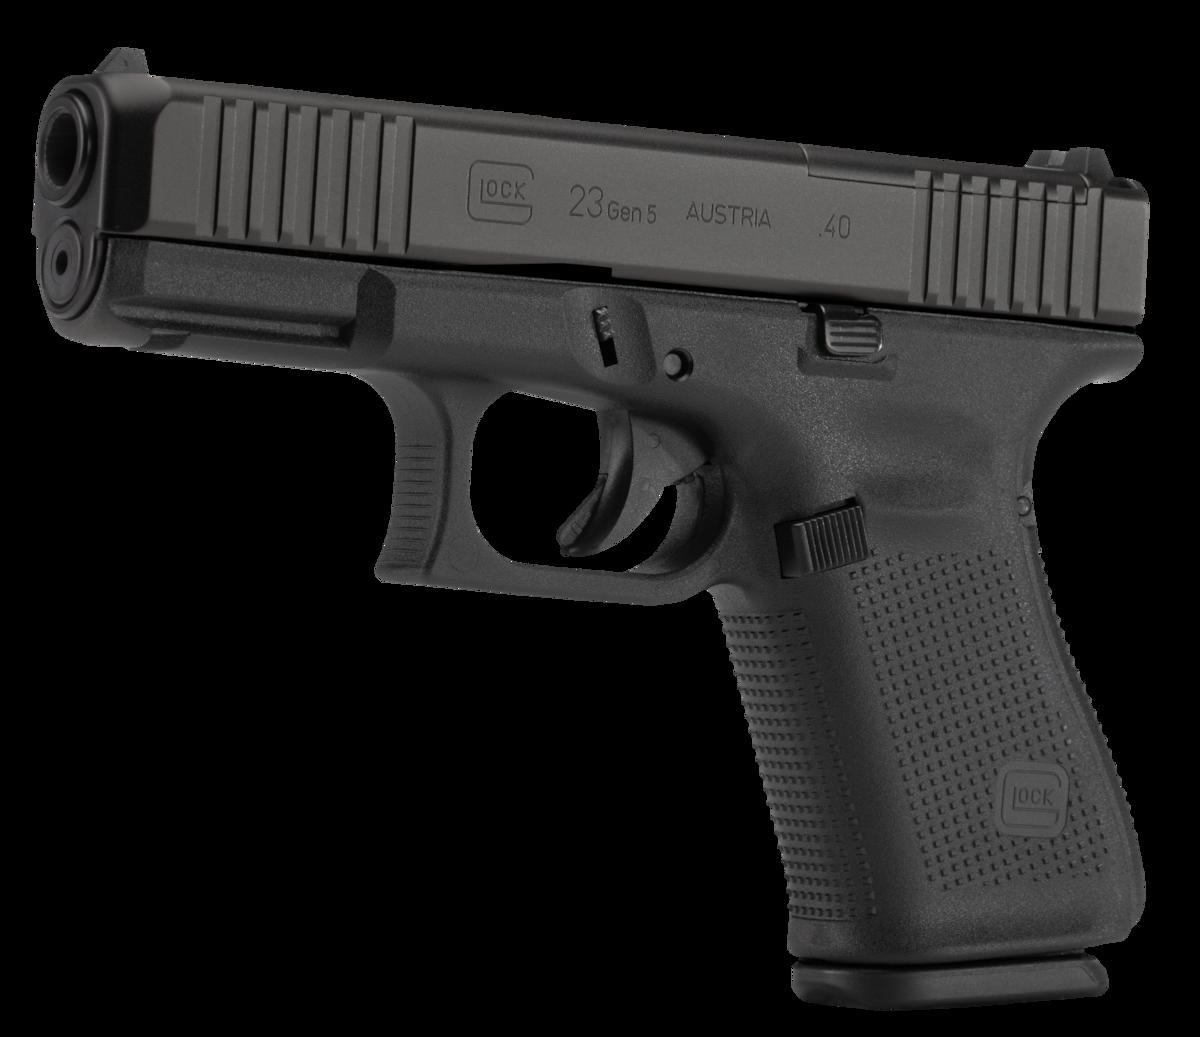 Glock G23 Gen5 Compact MOS